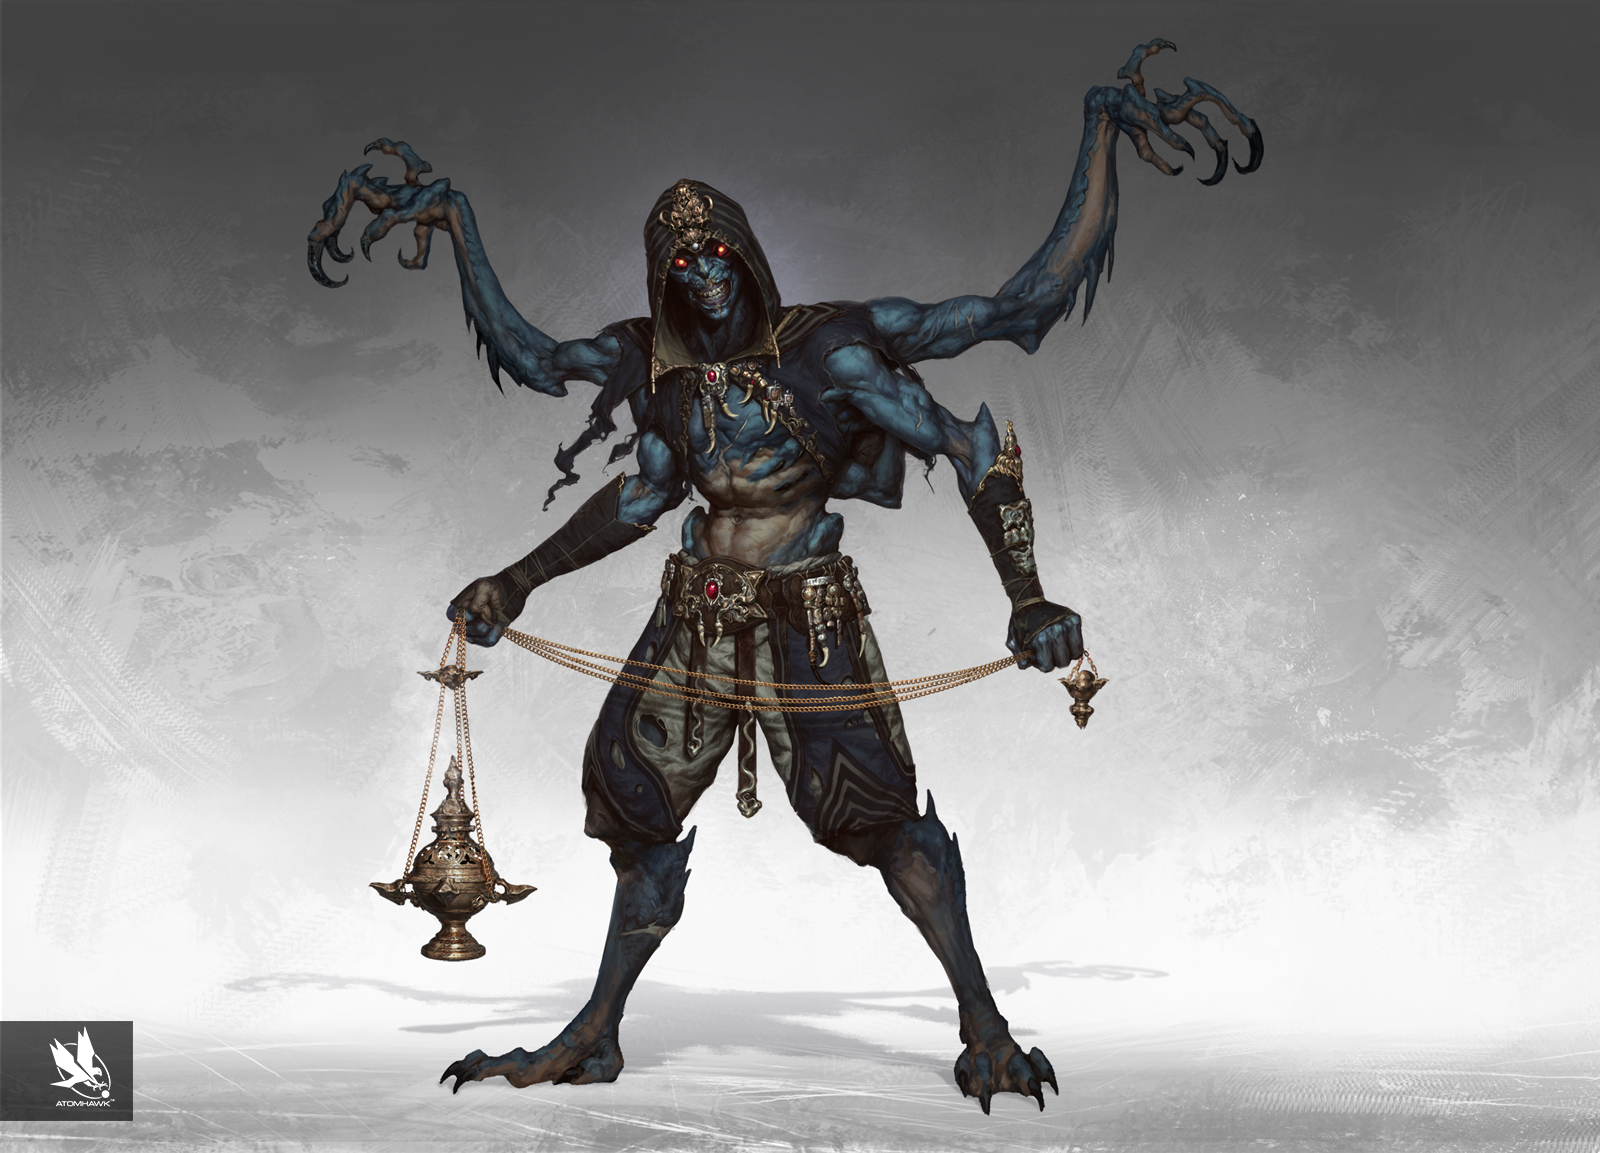 Atomhawk_Warner-Bros-NetherRealm_Mortal-Kombat-11_Concept-Art_Character-Design_Kollector_Present.jpg